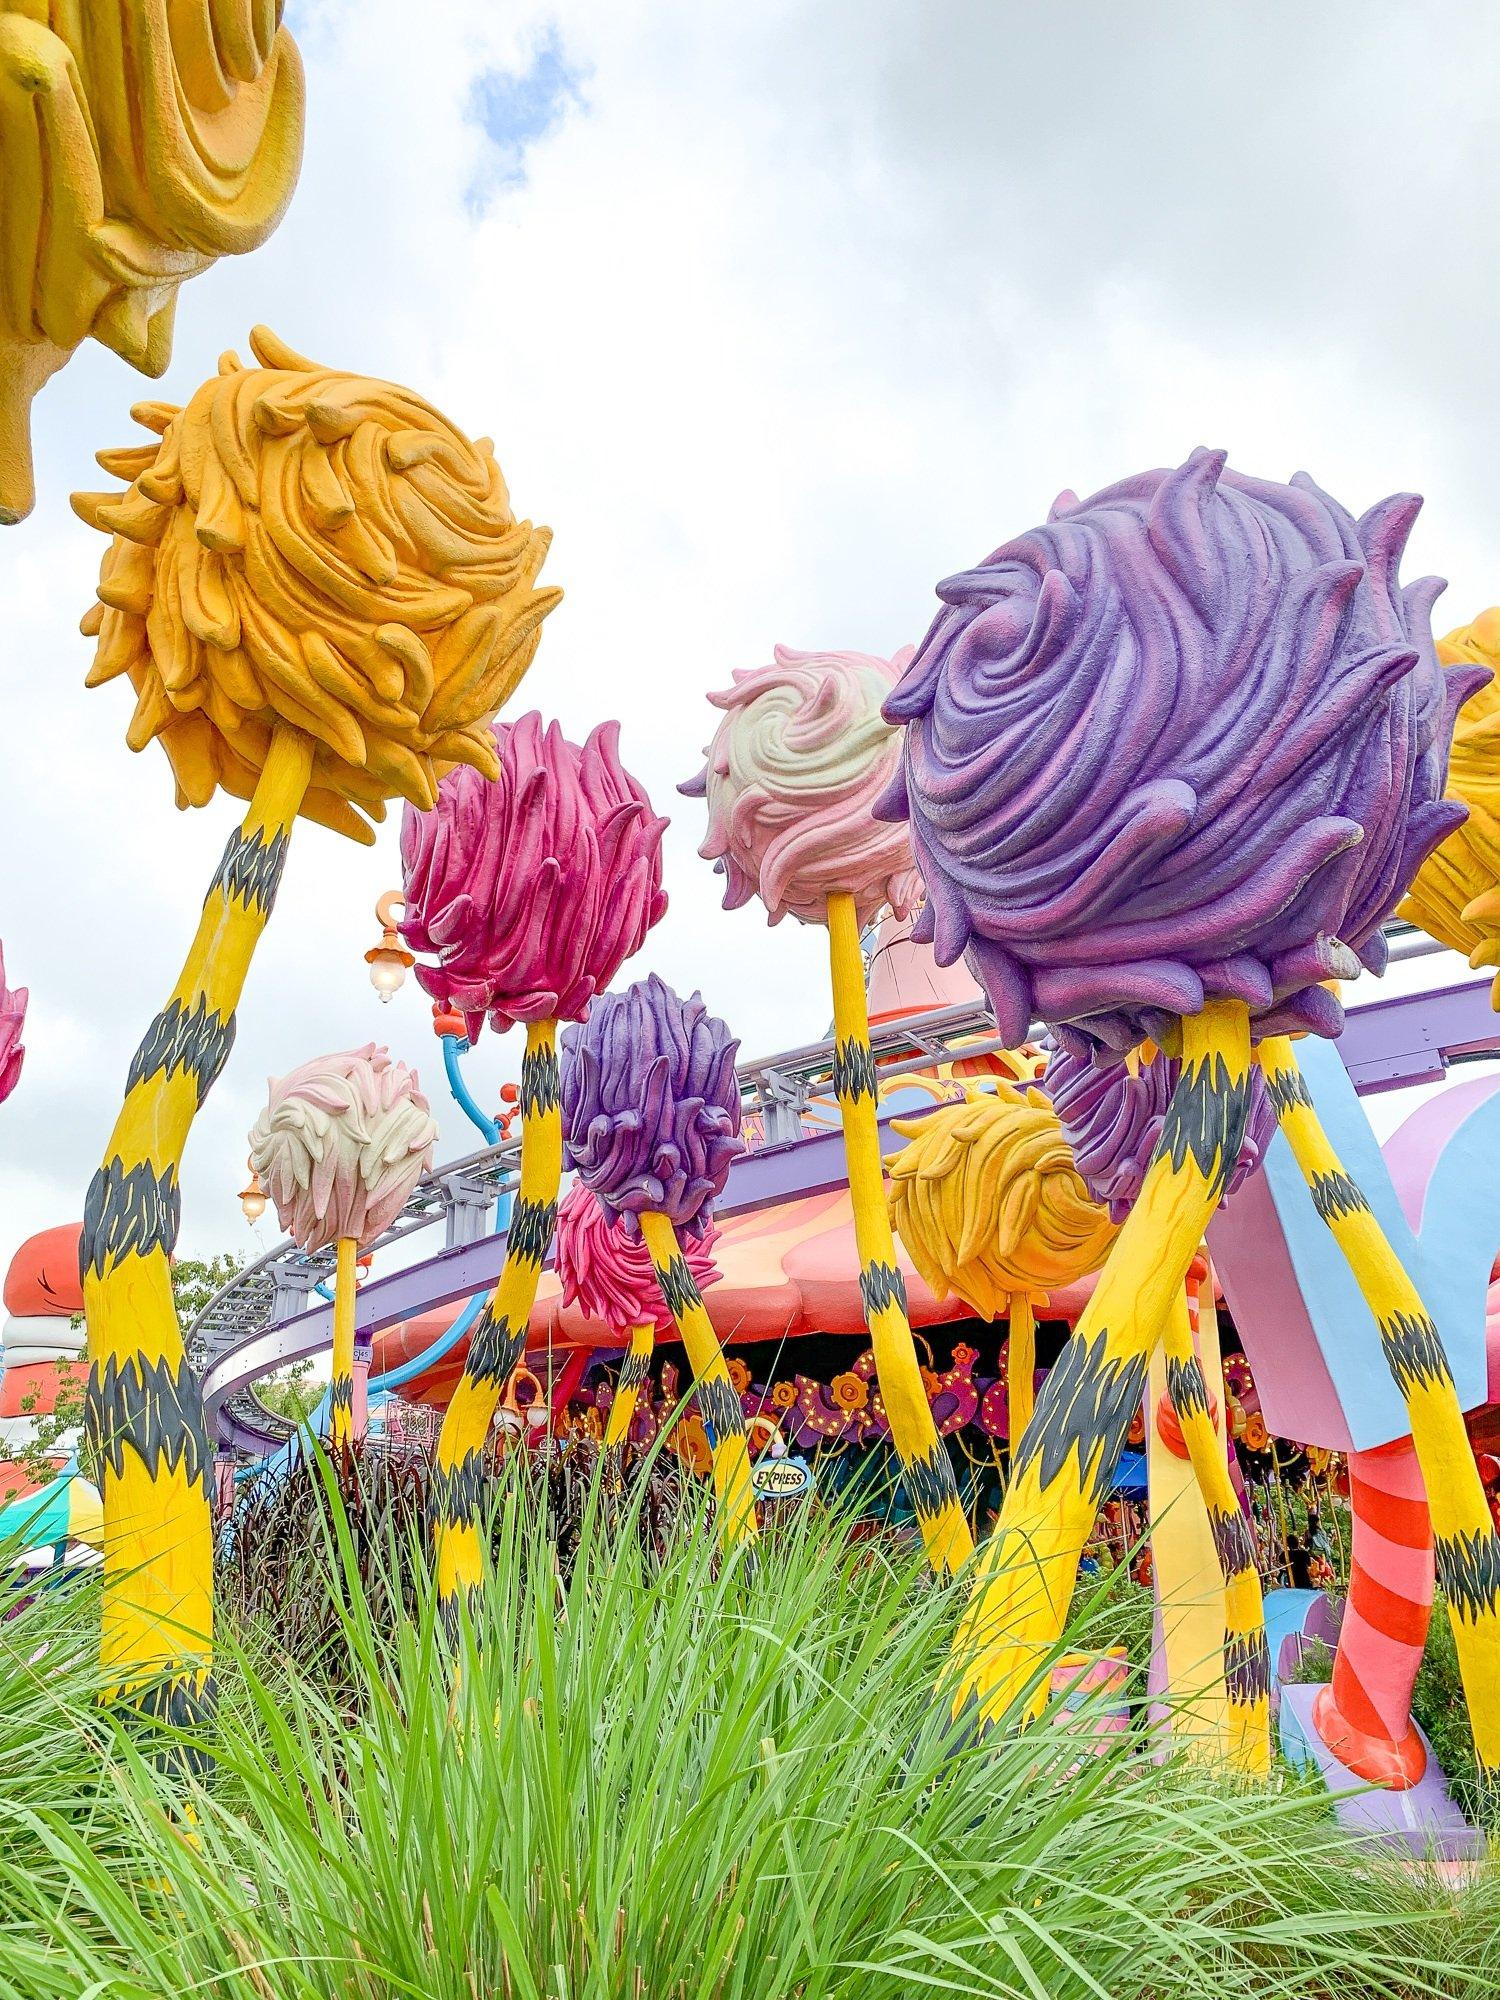 The Lorax's Truffula trees at Seuss Landing